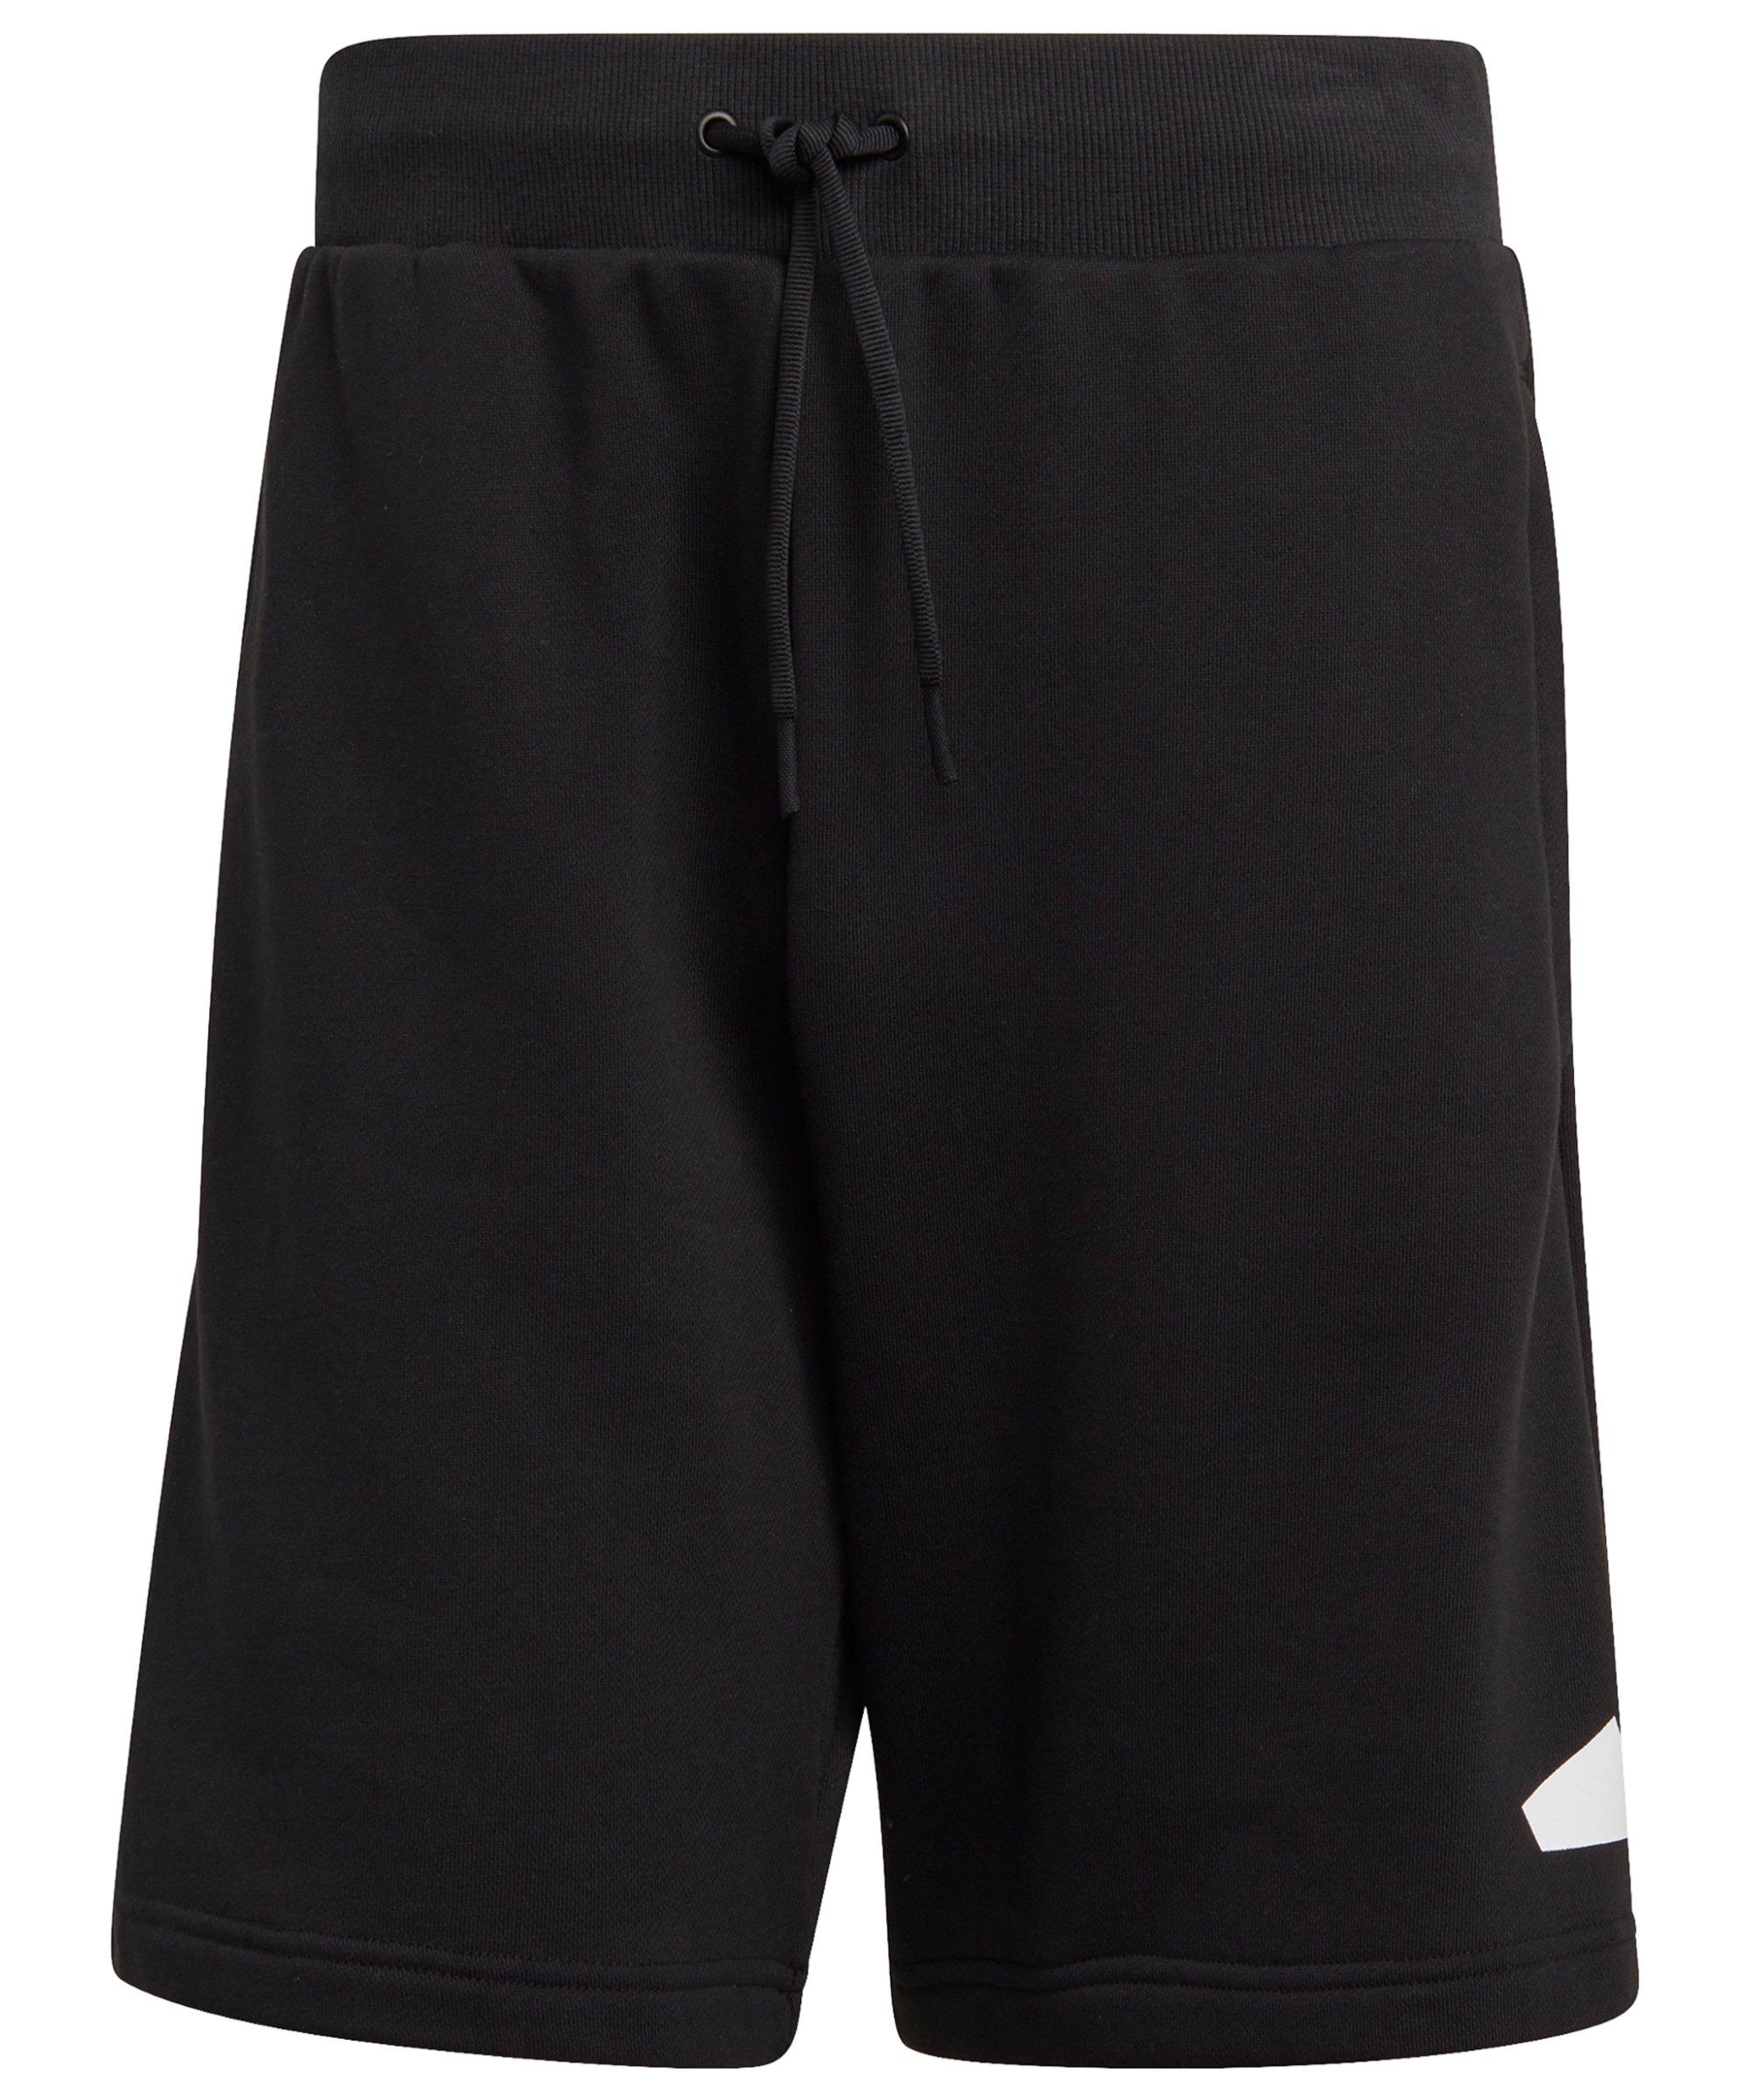 adidas FI Training Short Schwarz - schwarz